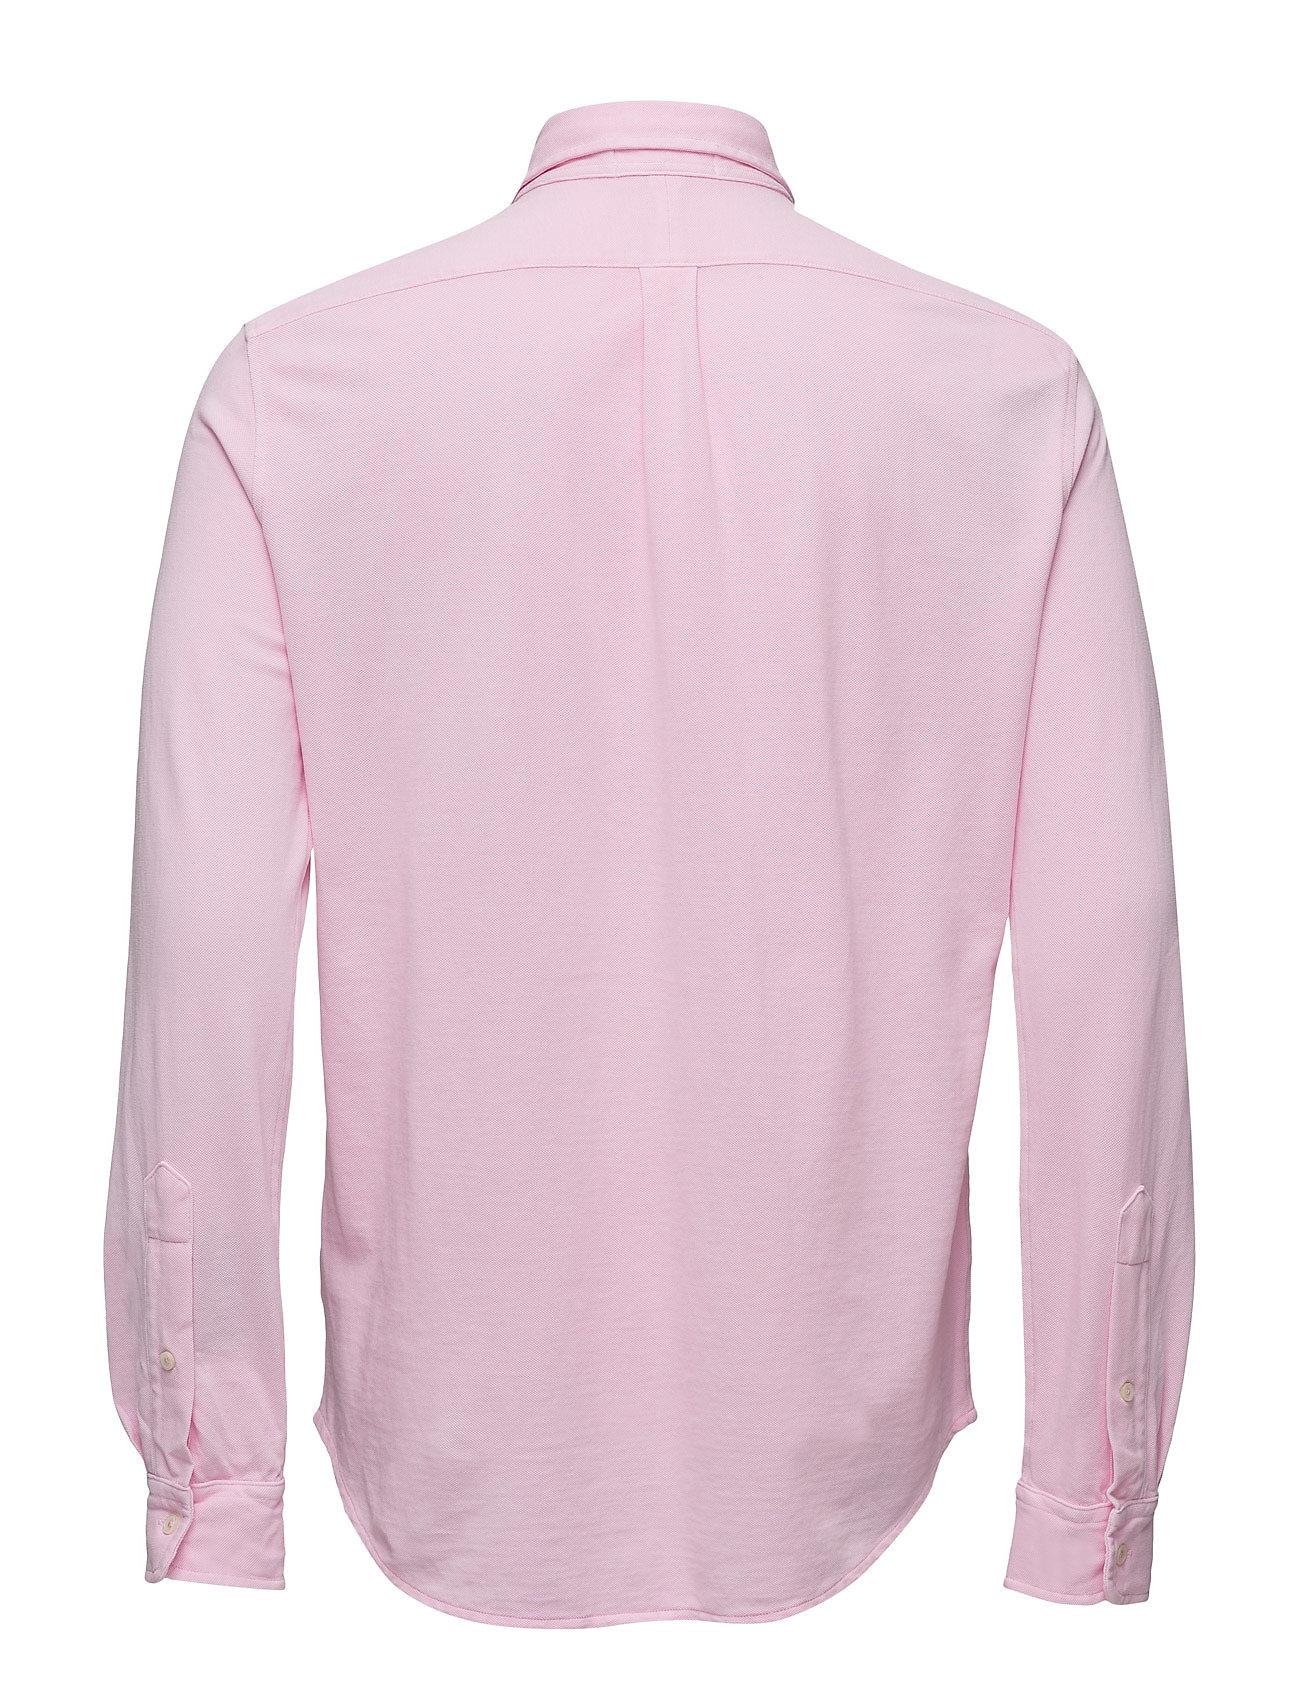 Shirtcarmel Mesh Custom PinkPolo Featherweight Fit Lauren Ralph UGSjLqzMpV